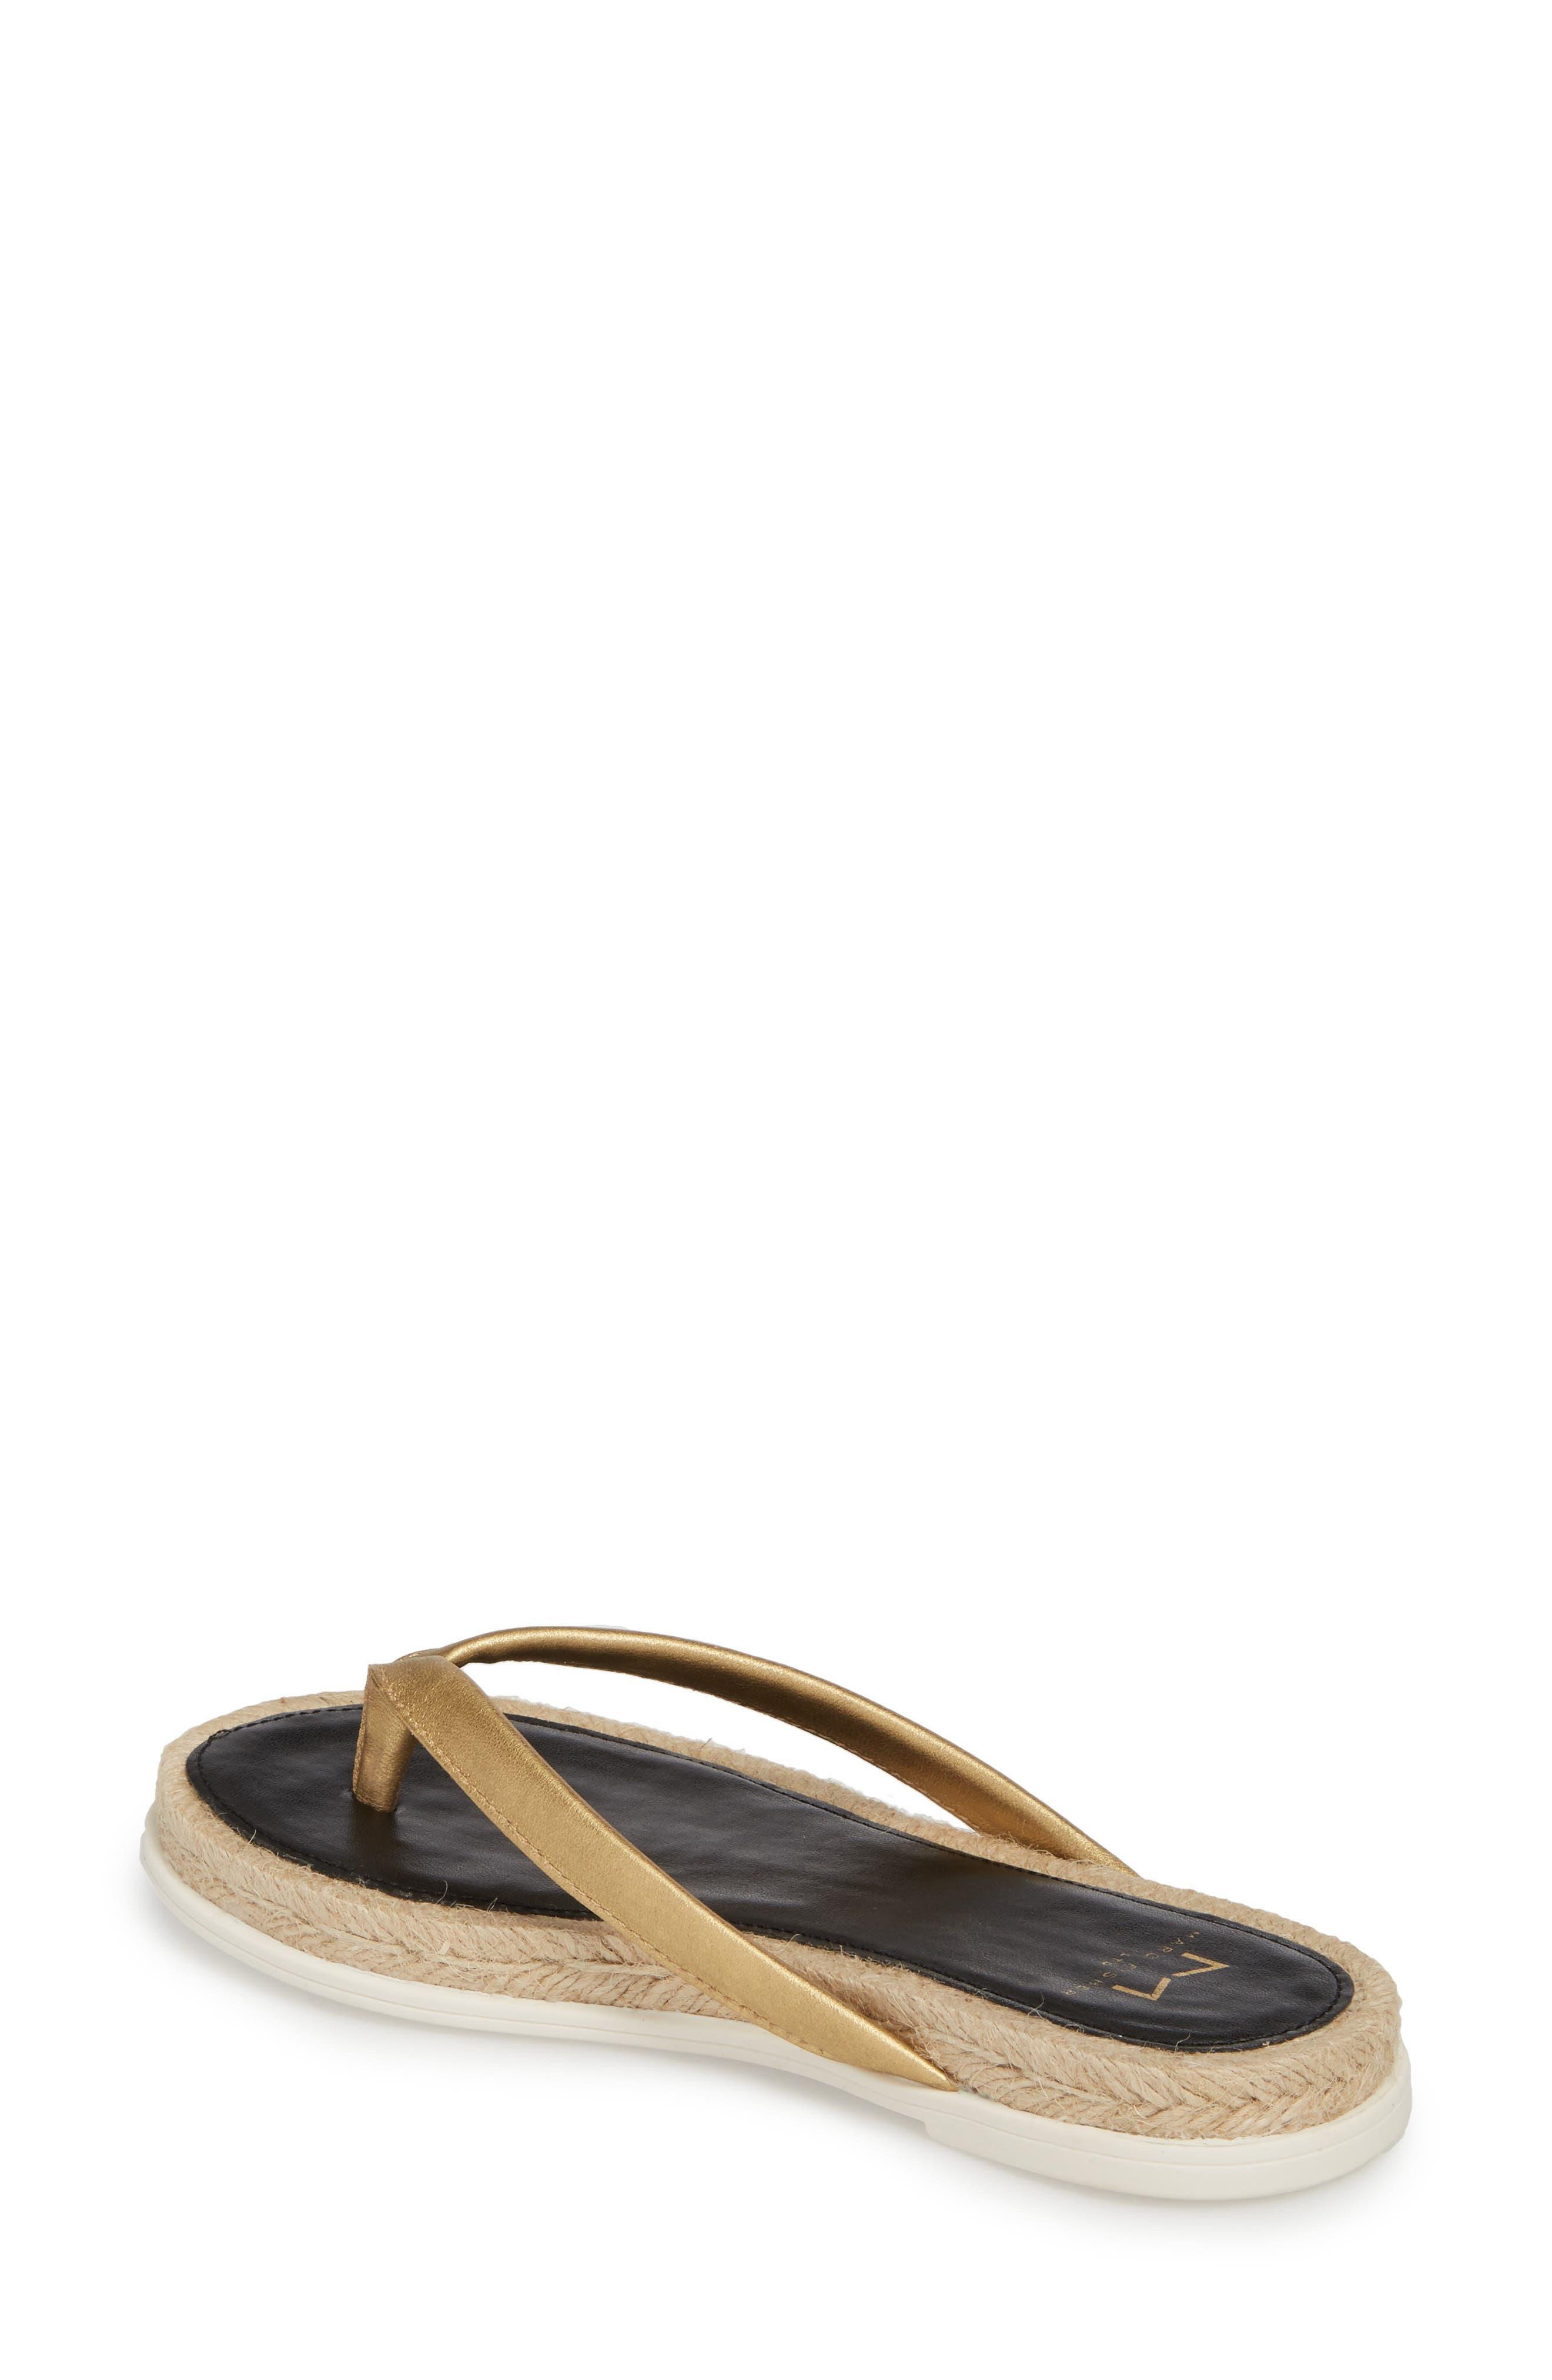 Utah Espadrille Sandal,                             Alternate thumbnail 6, color,